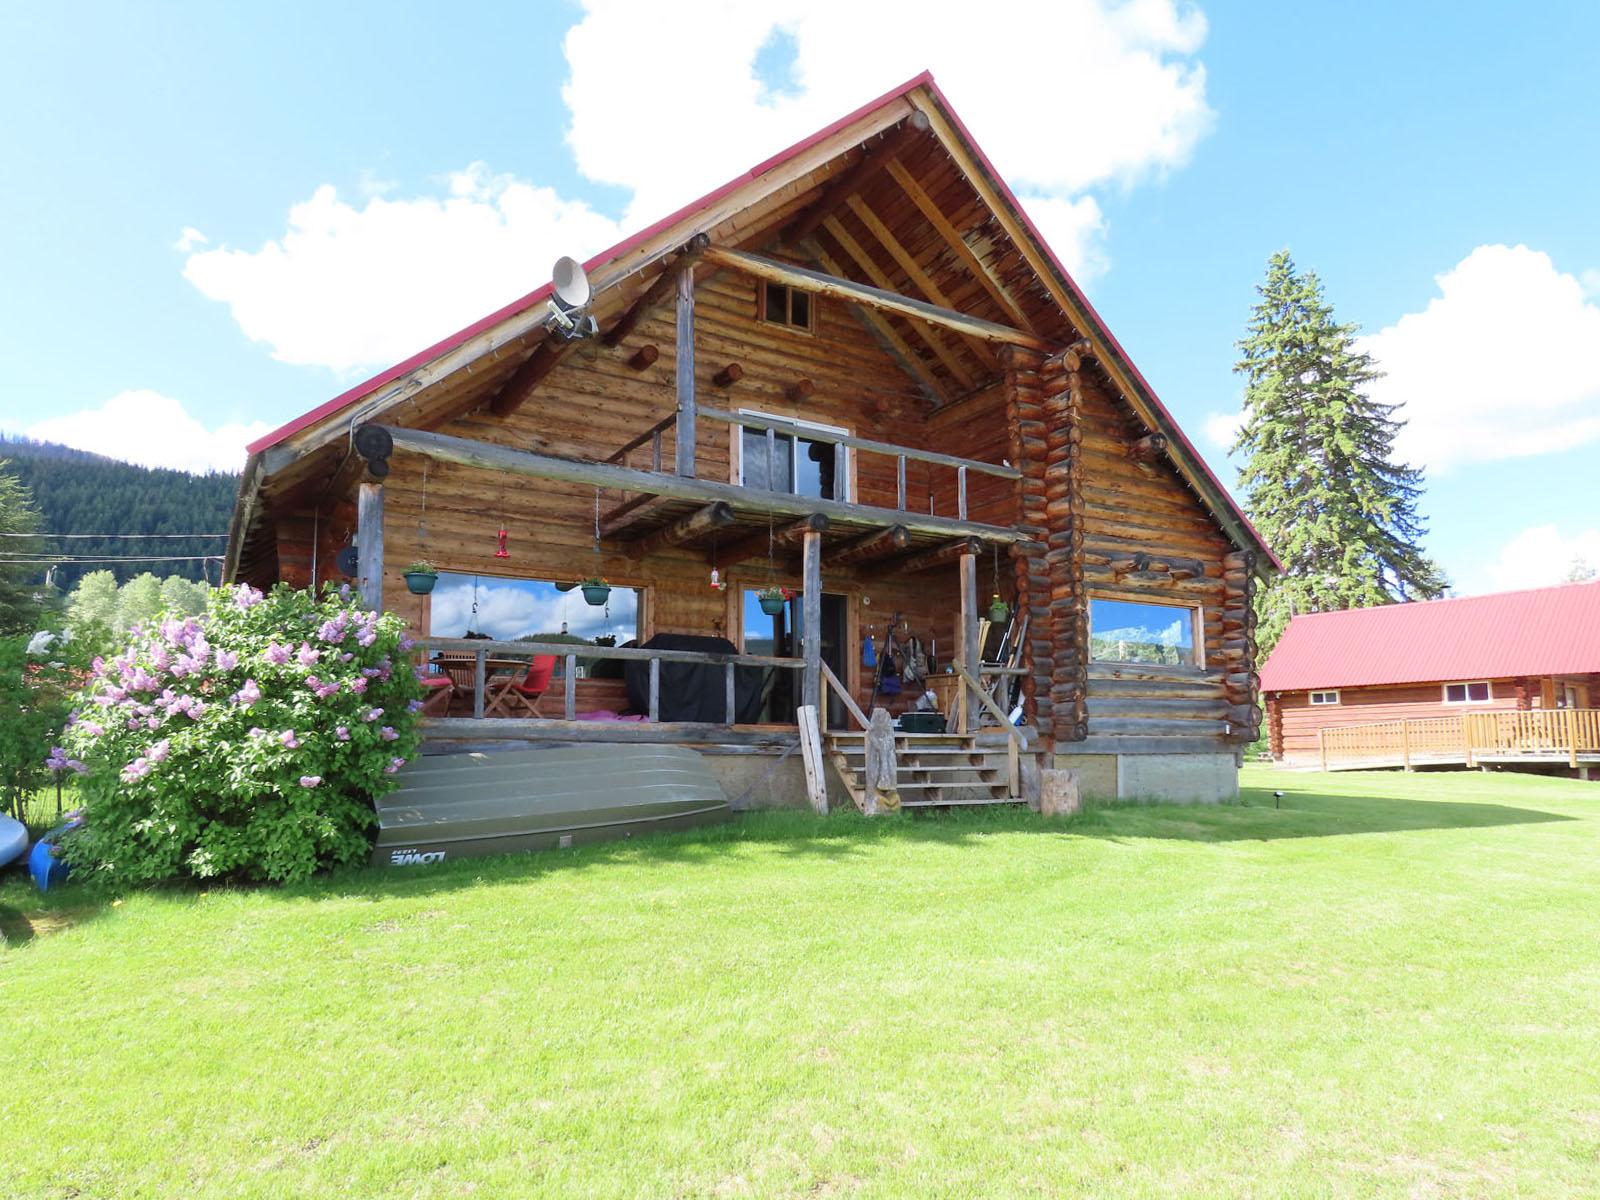 Canim lake resort 38